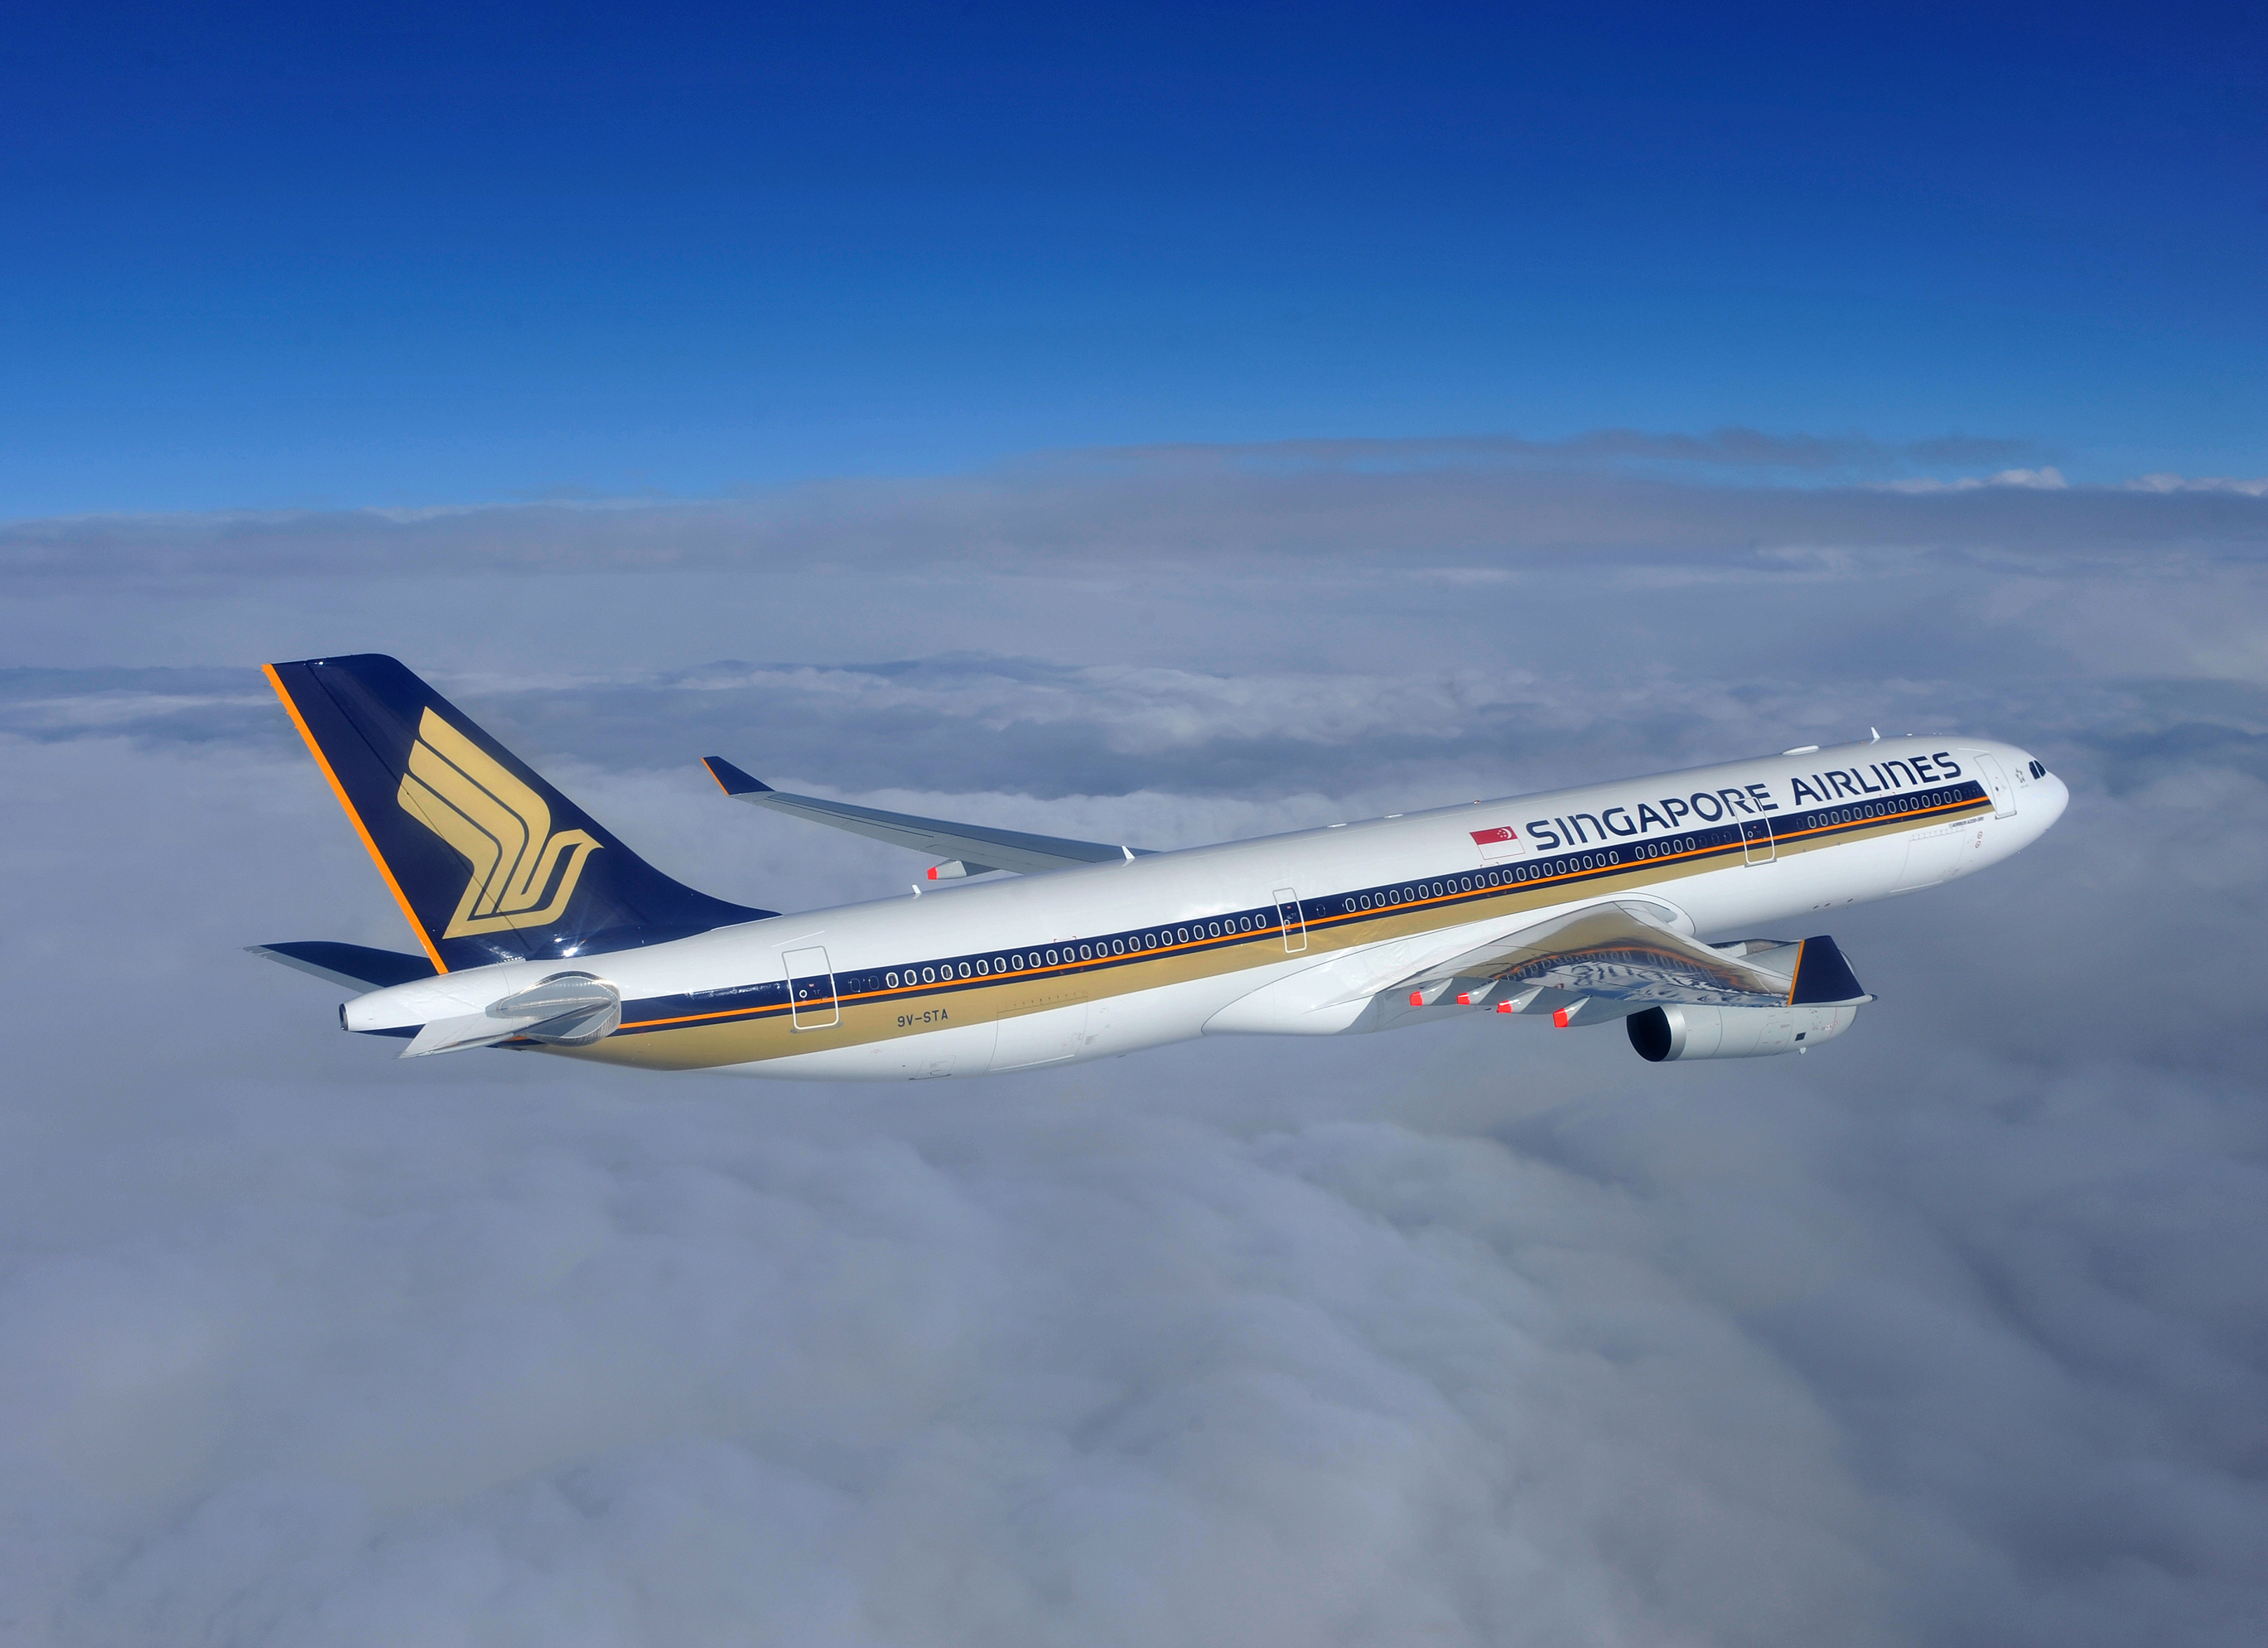 SIA Fleet: Airbus A330-300 – Mainly Miles